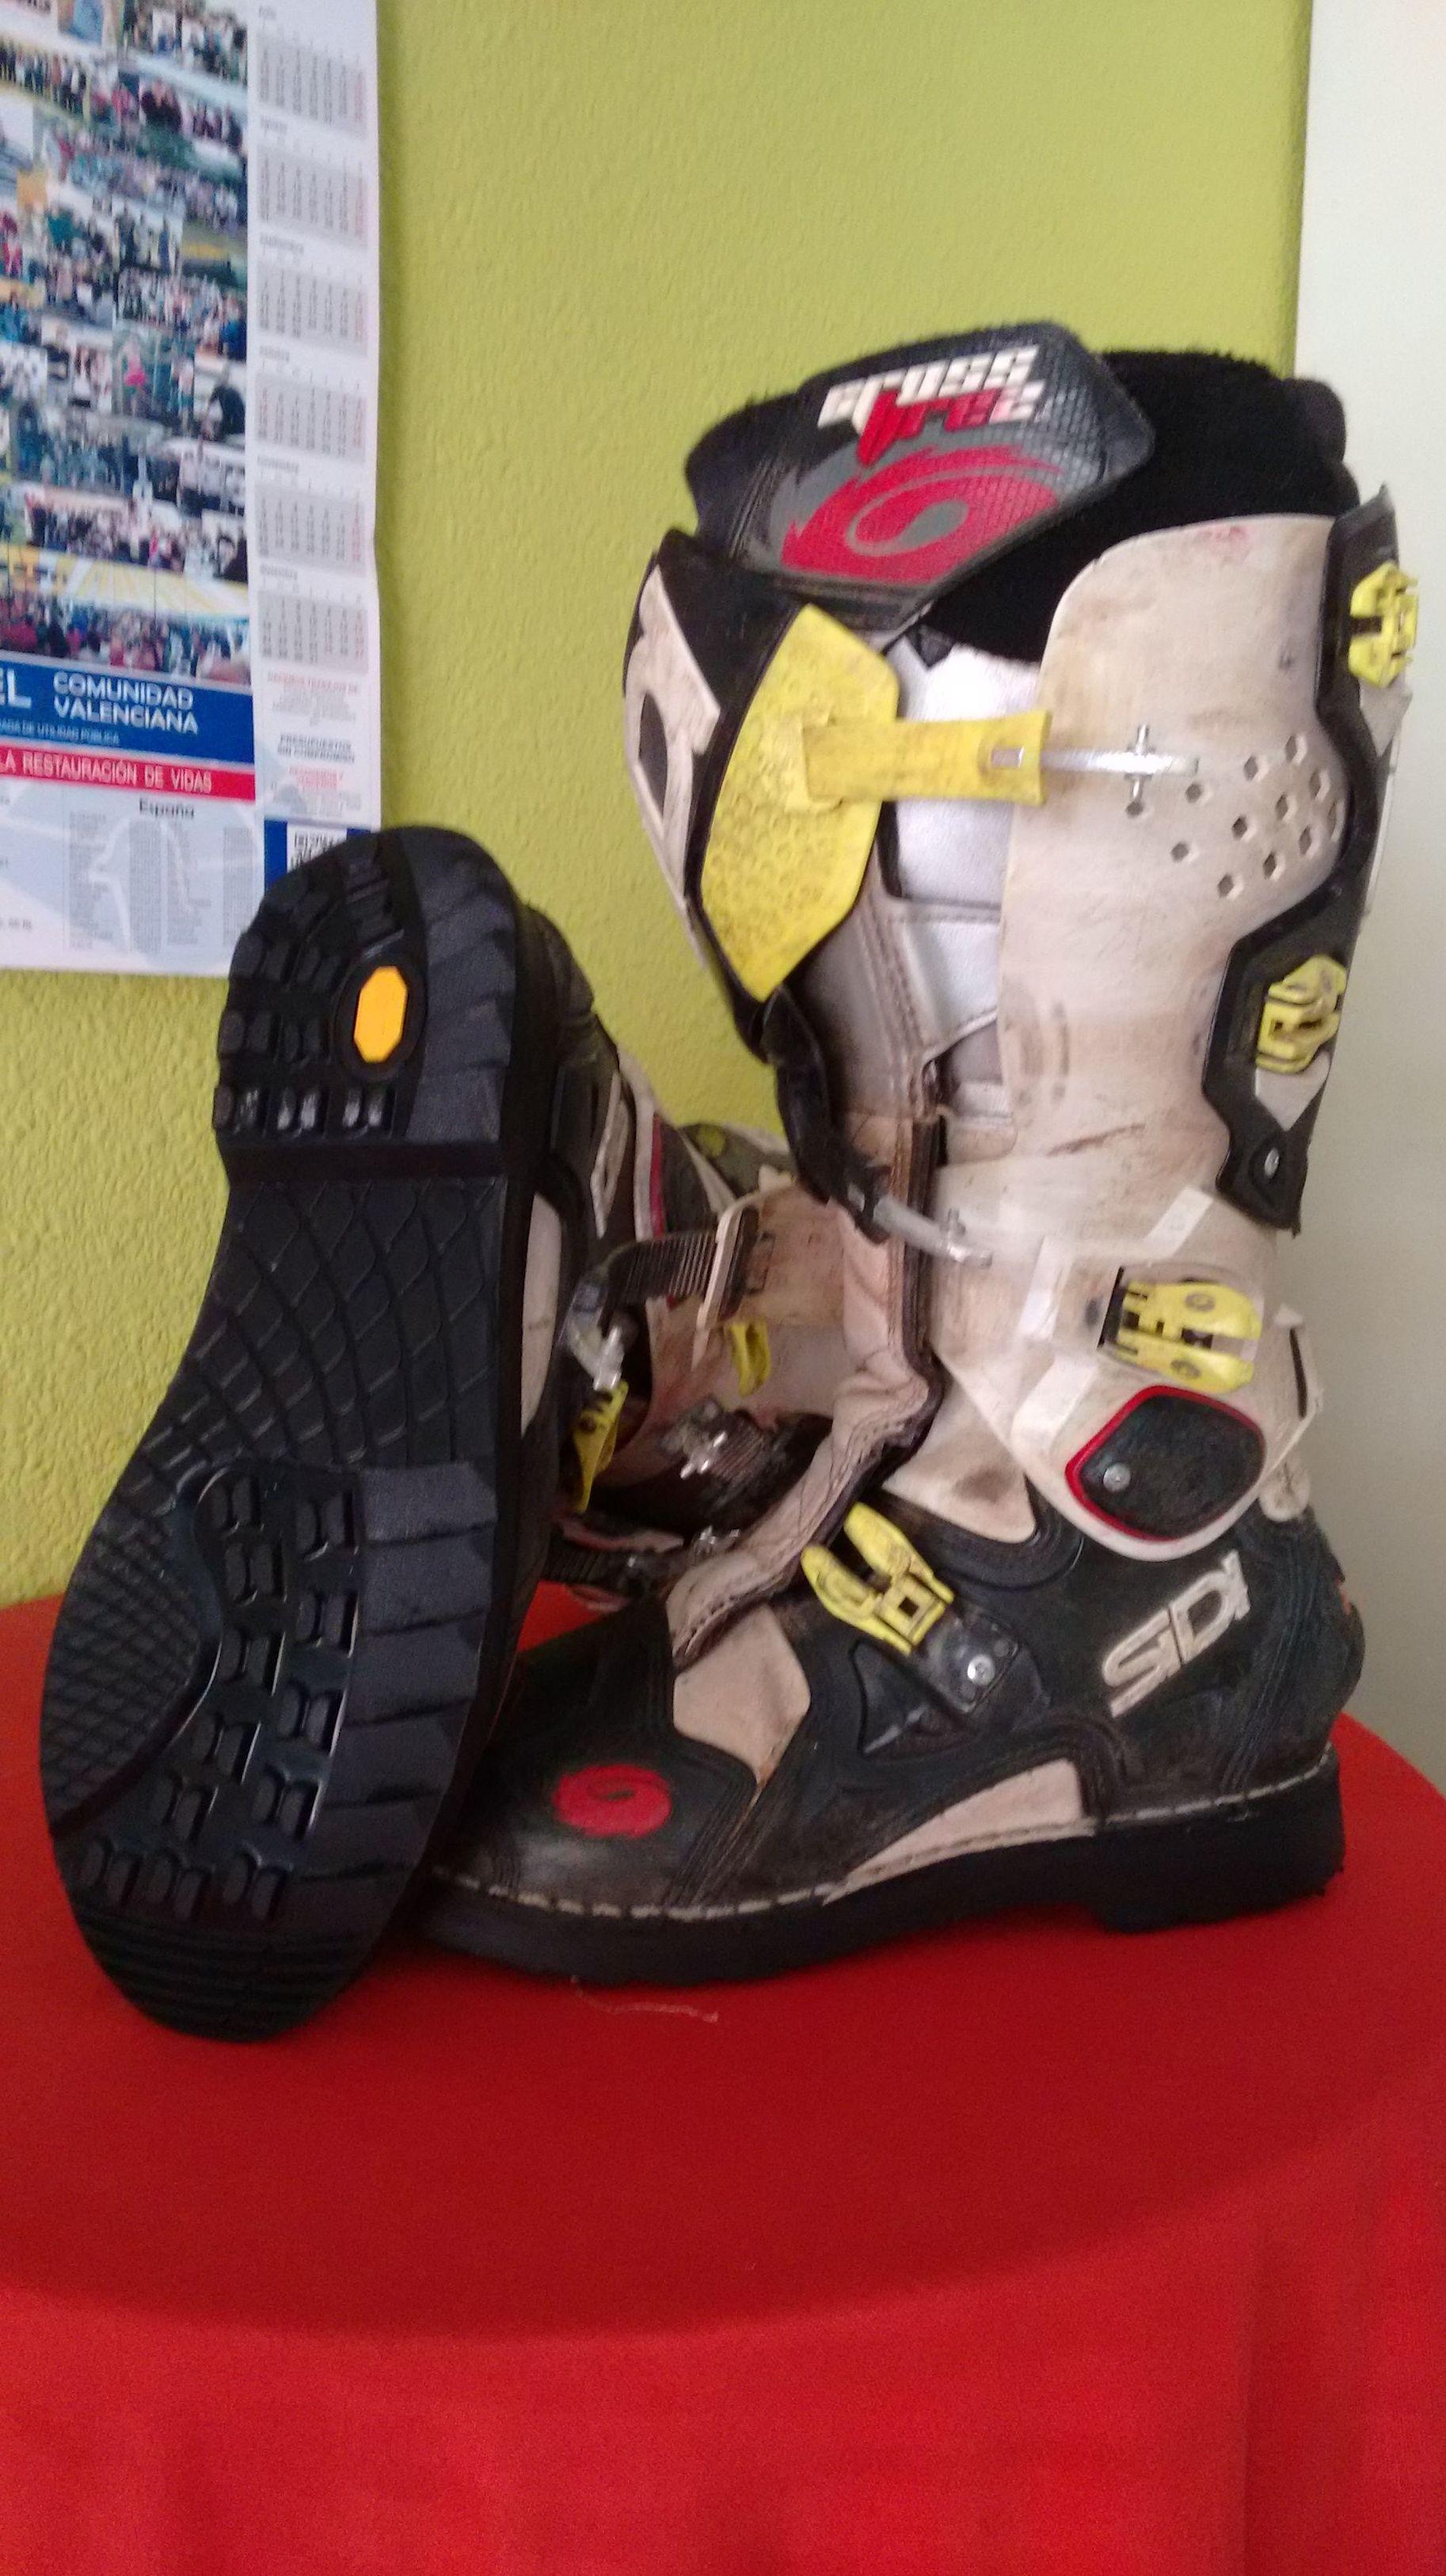 Foto 49 de Reparación de calzado en Castellón | Roig Vidal